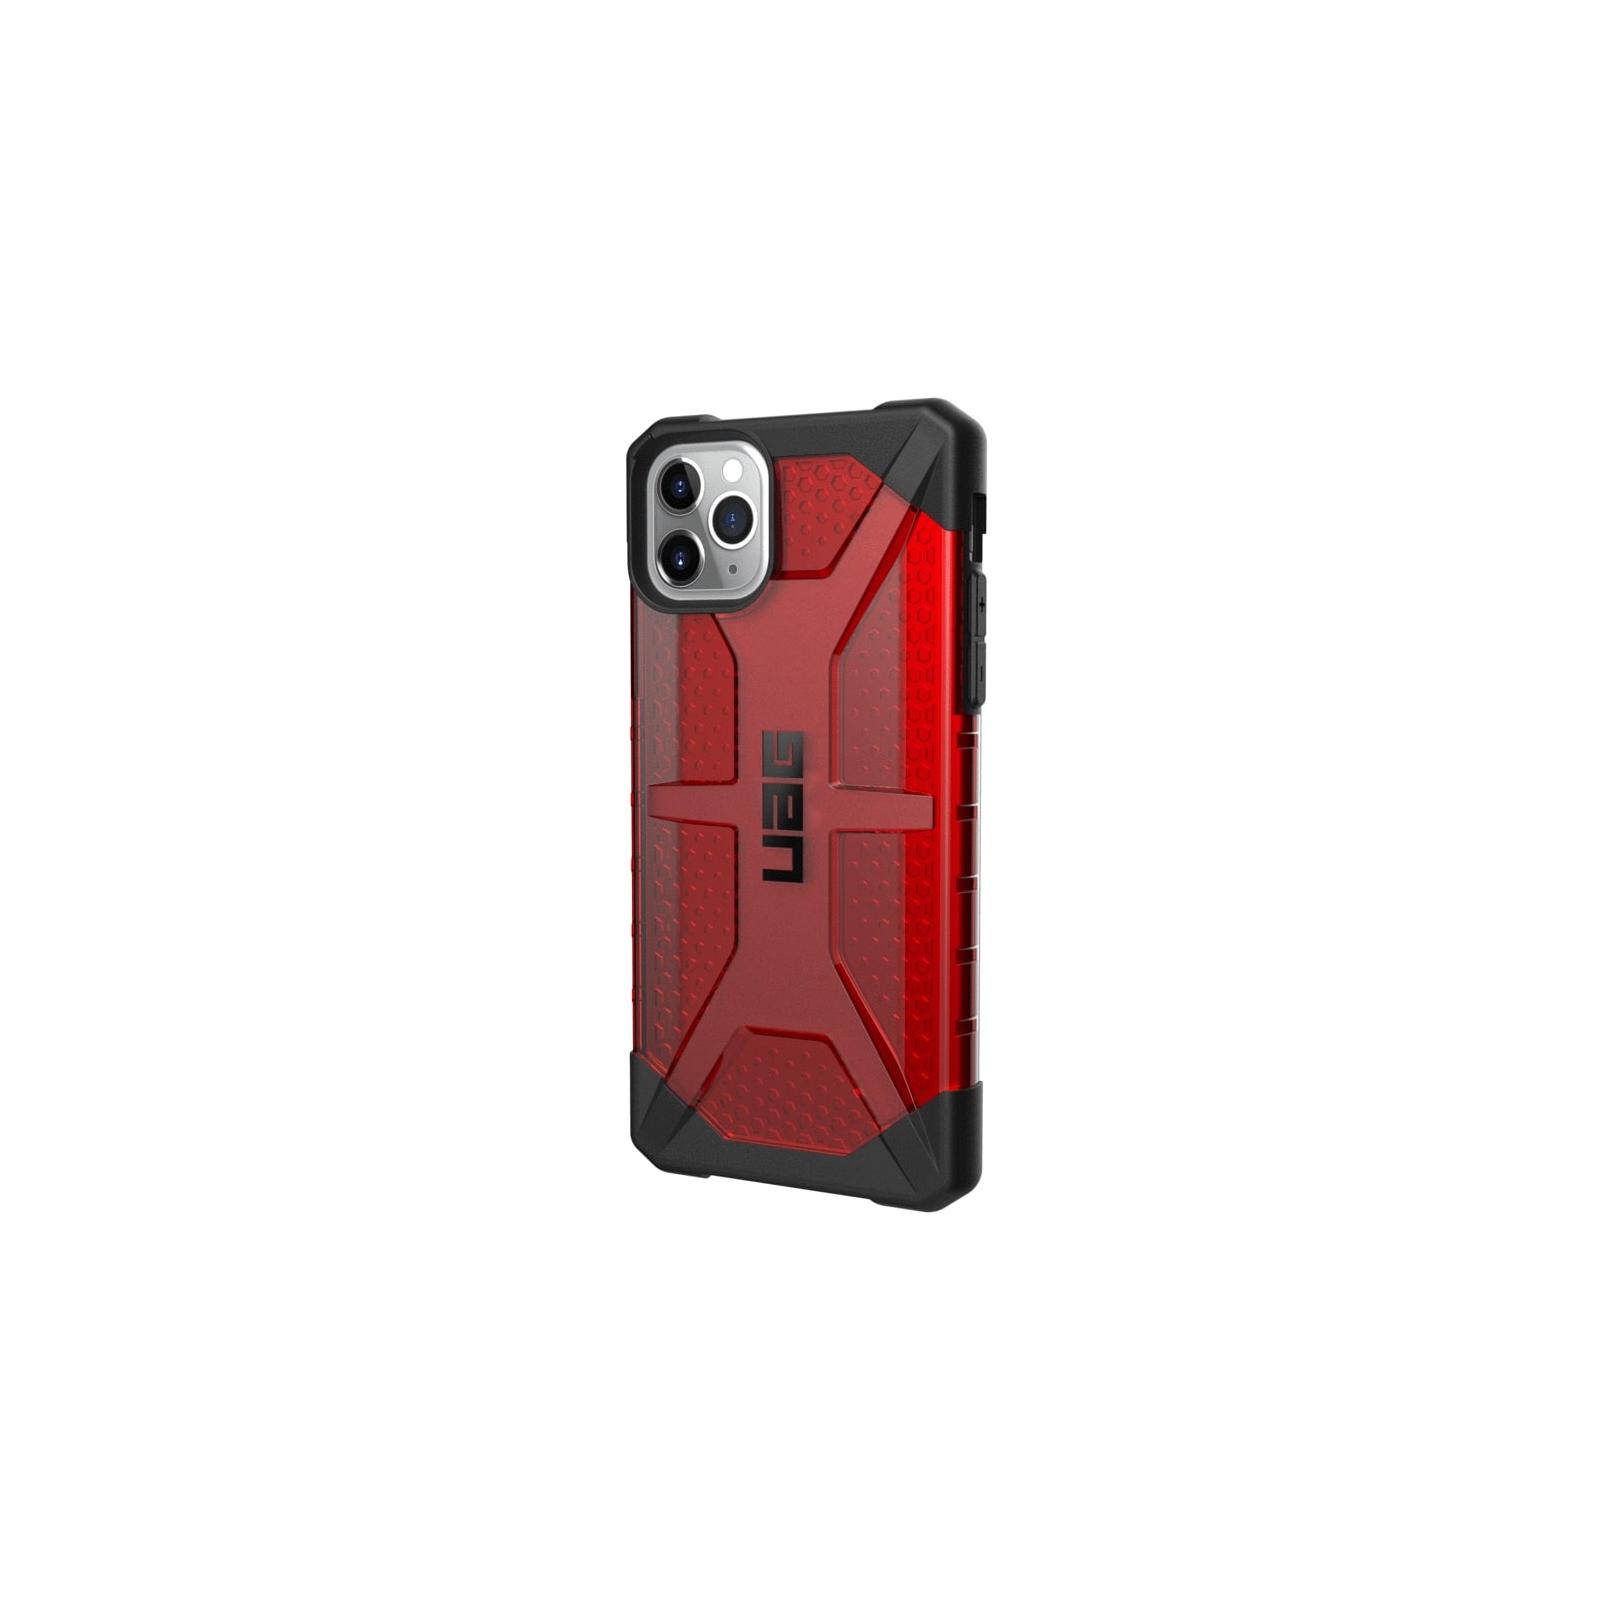 Чехол для моб. телефона Uag iPhone 11 Pro Max Plasma, Magma (111723119393) изображение 3